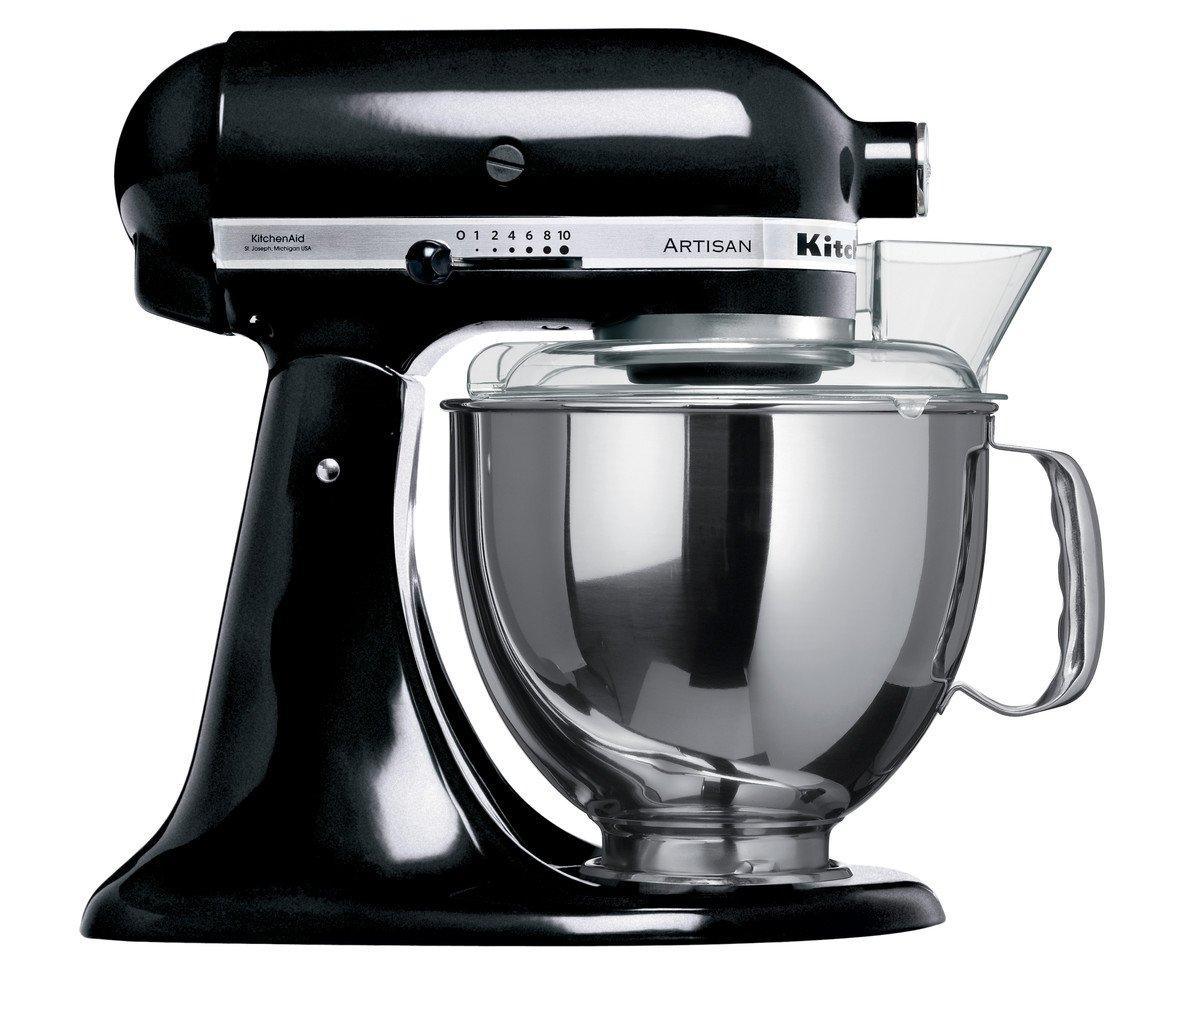 Amazon.de: Kitchenaid 5KSM150PSEOB Küchenmaschine, schwarz